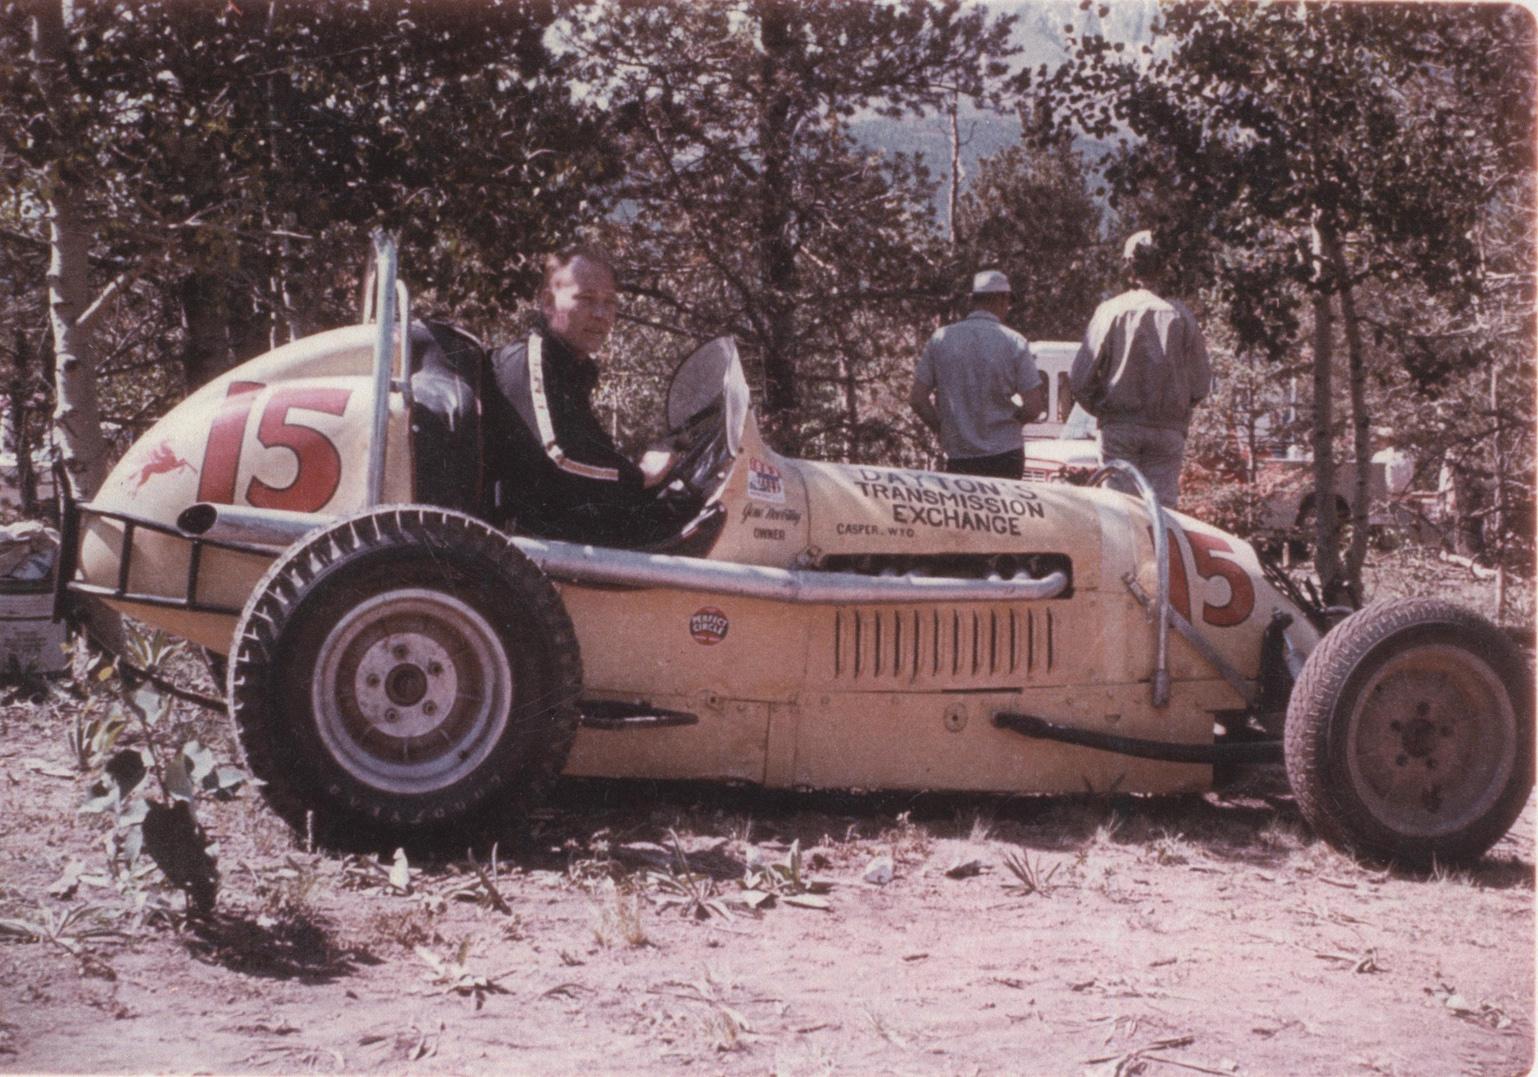 Bumble Bee - Pikes Peak 1965